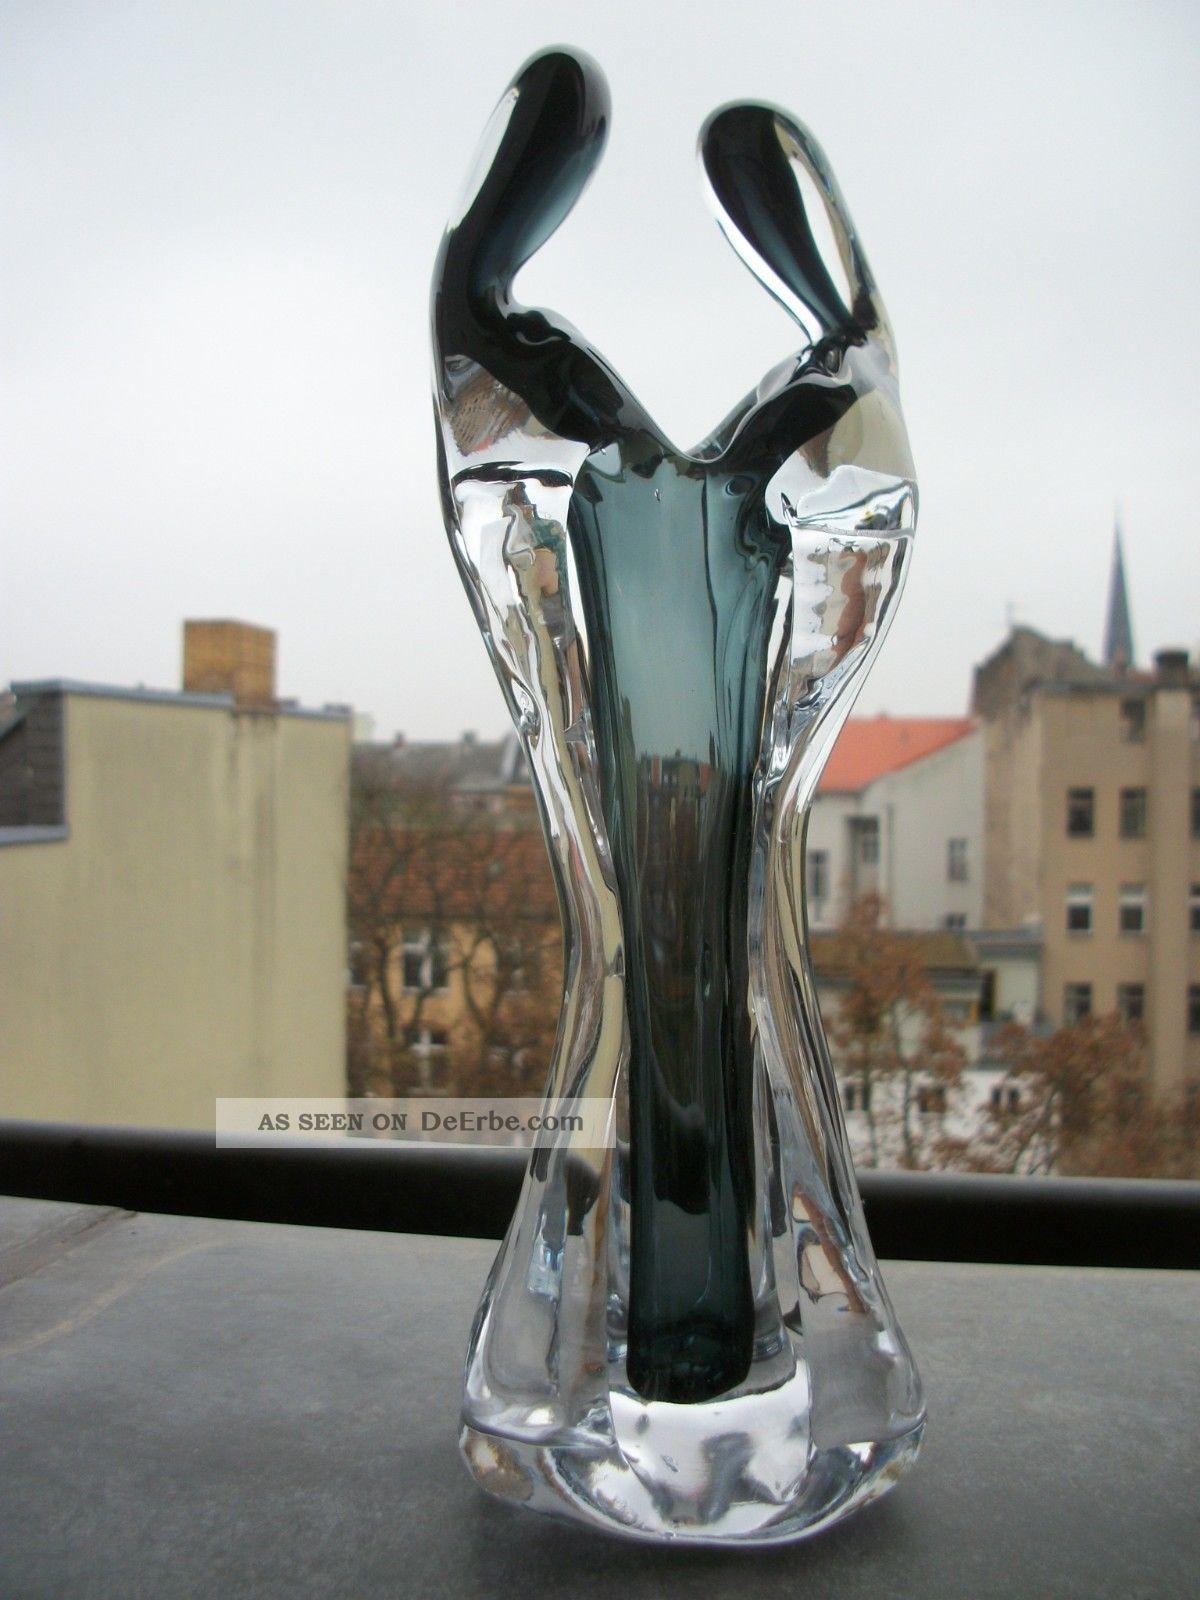 Xxl Murano Glas Skulptur Objekt Unikat Schwarzgrau Klar Glas